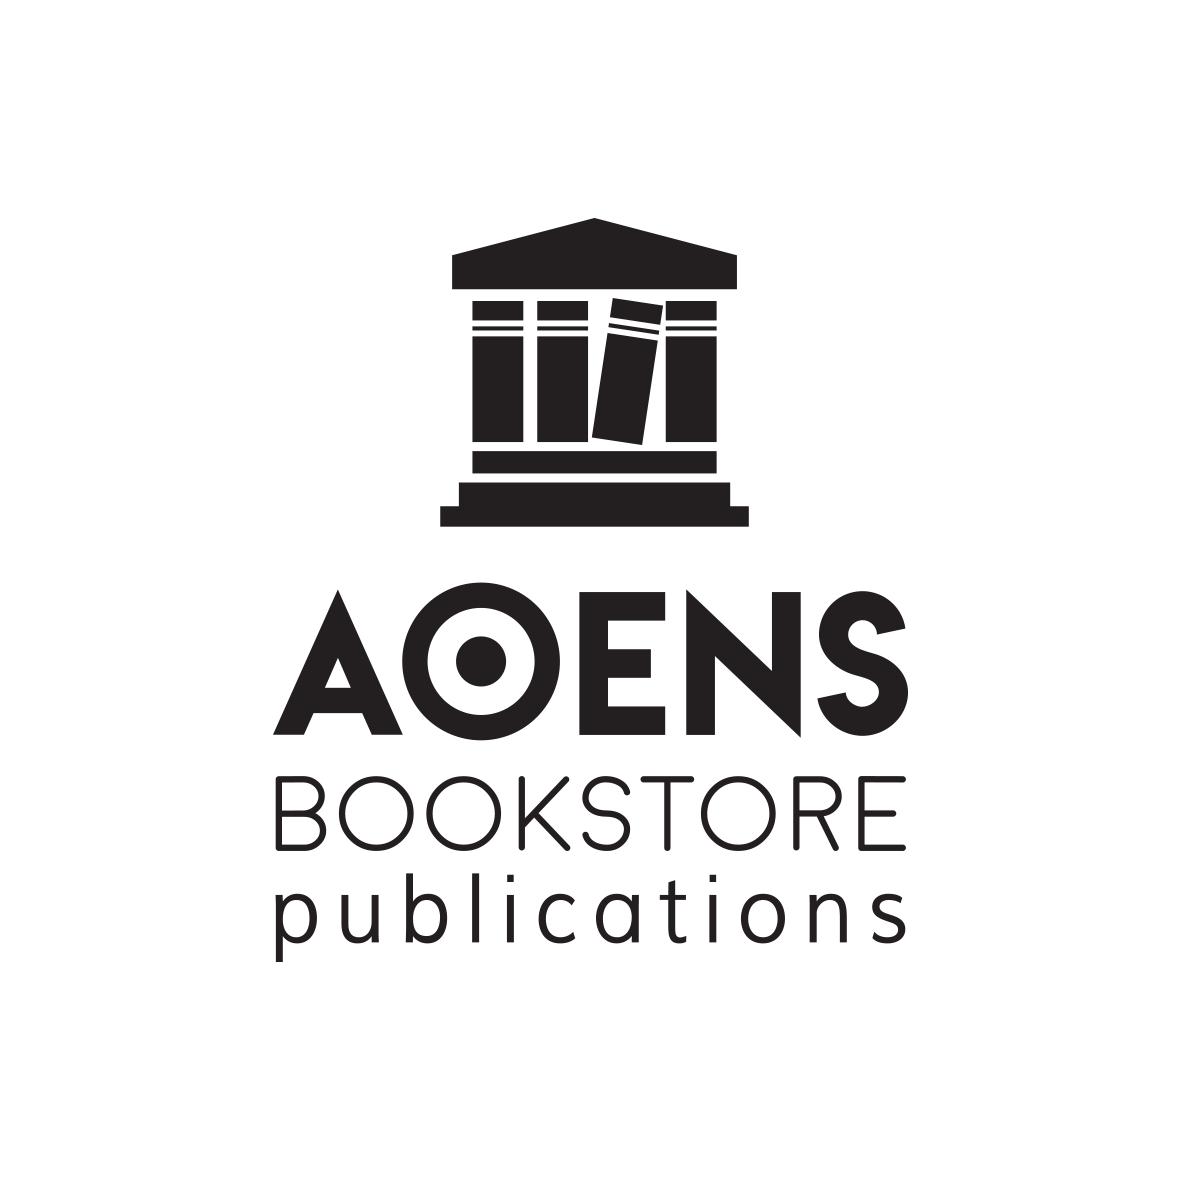 Athens Bookstore Publications